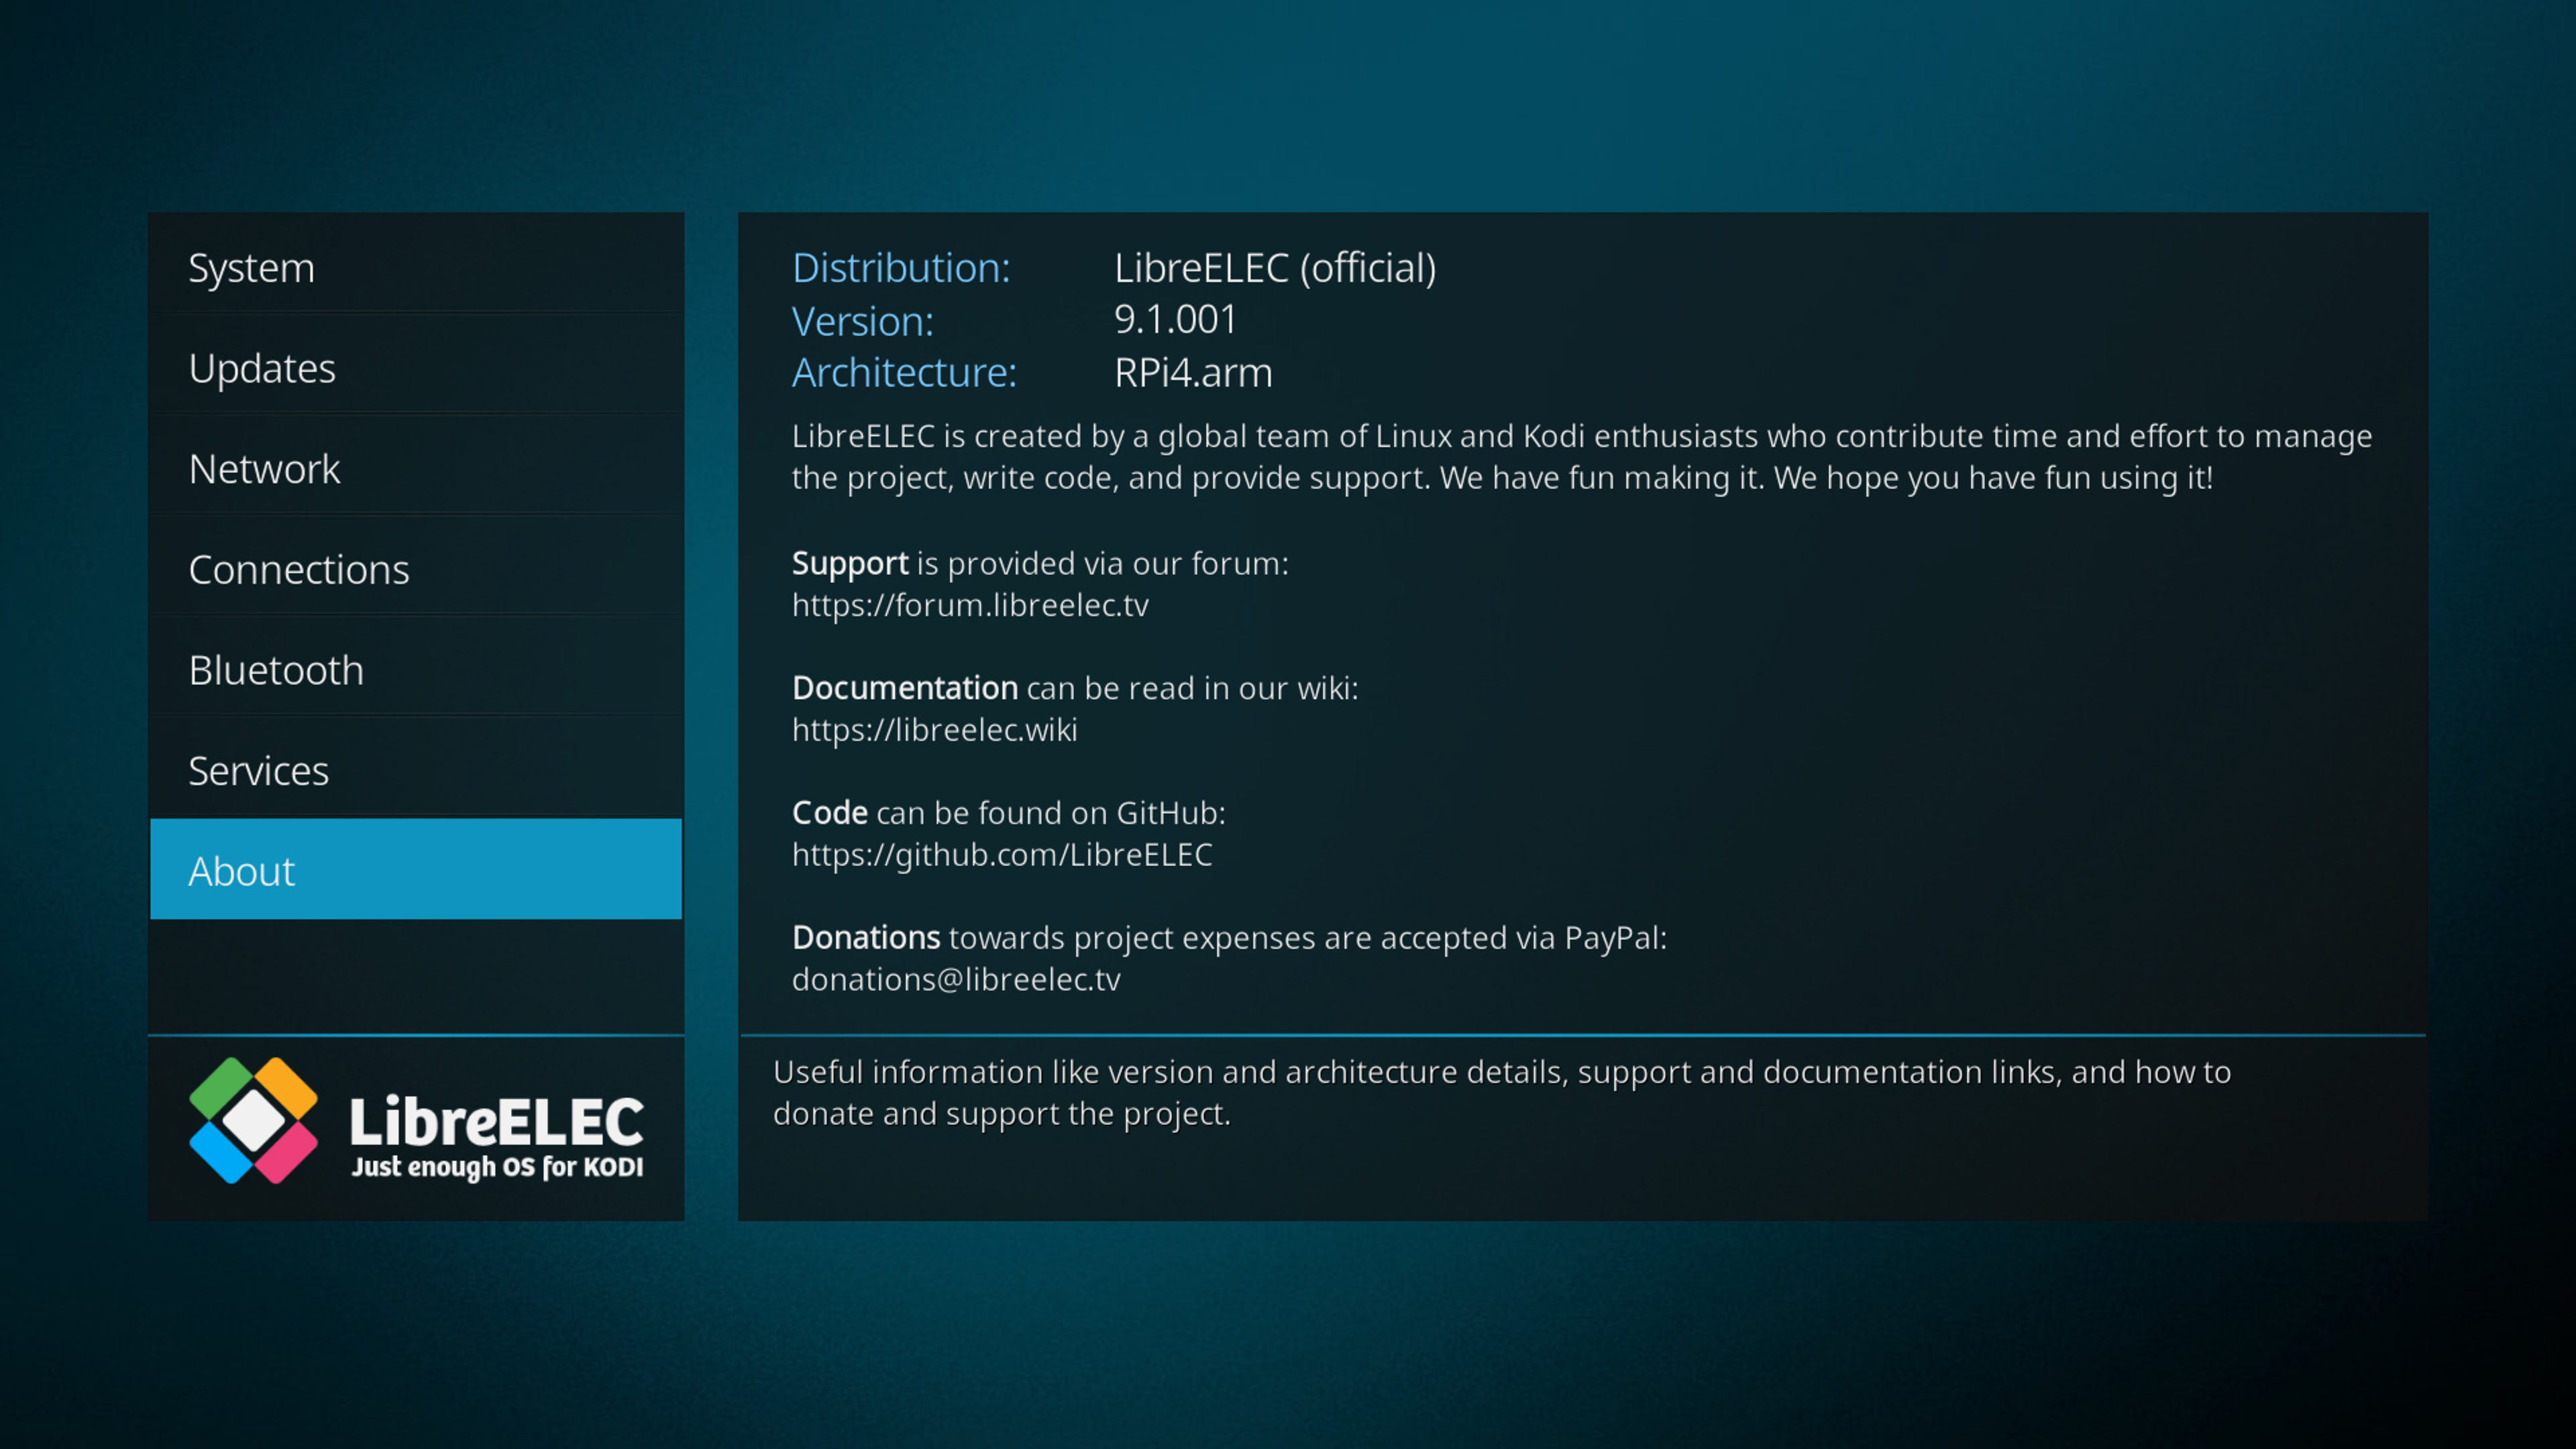 4K Video Playback on Raspberry Pi 4 with LibreELEC (Alpha)